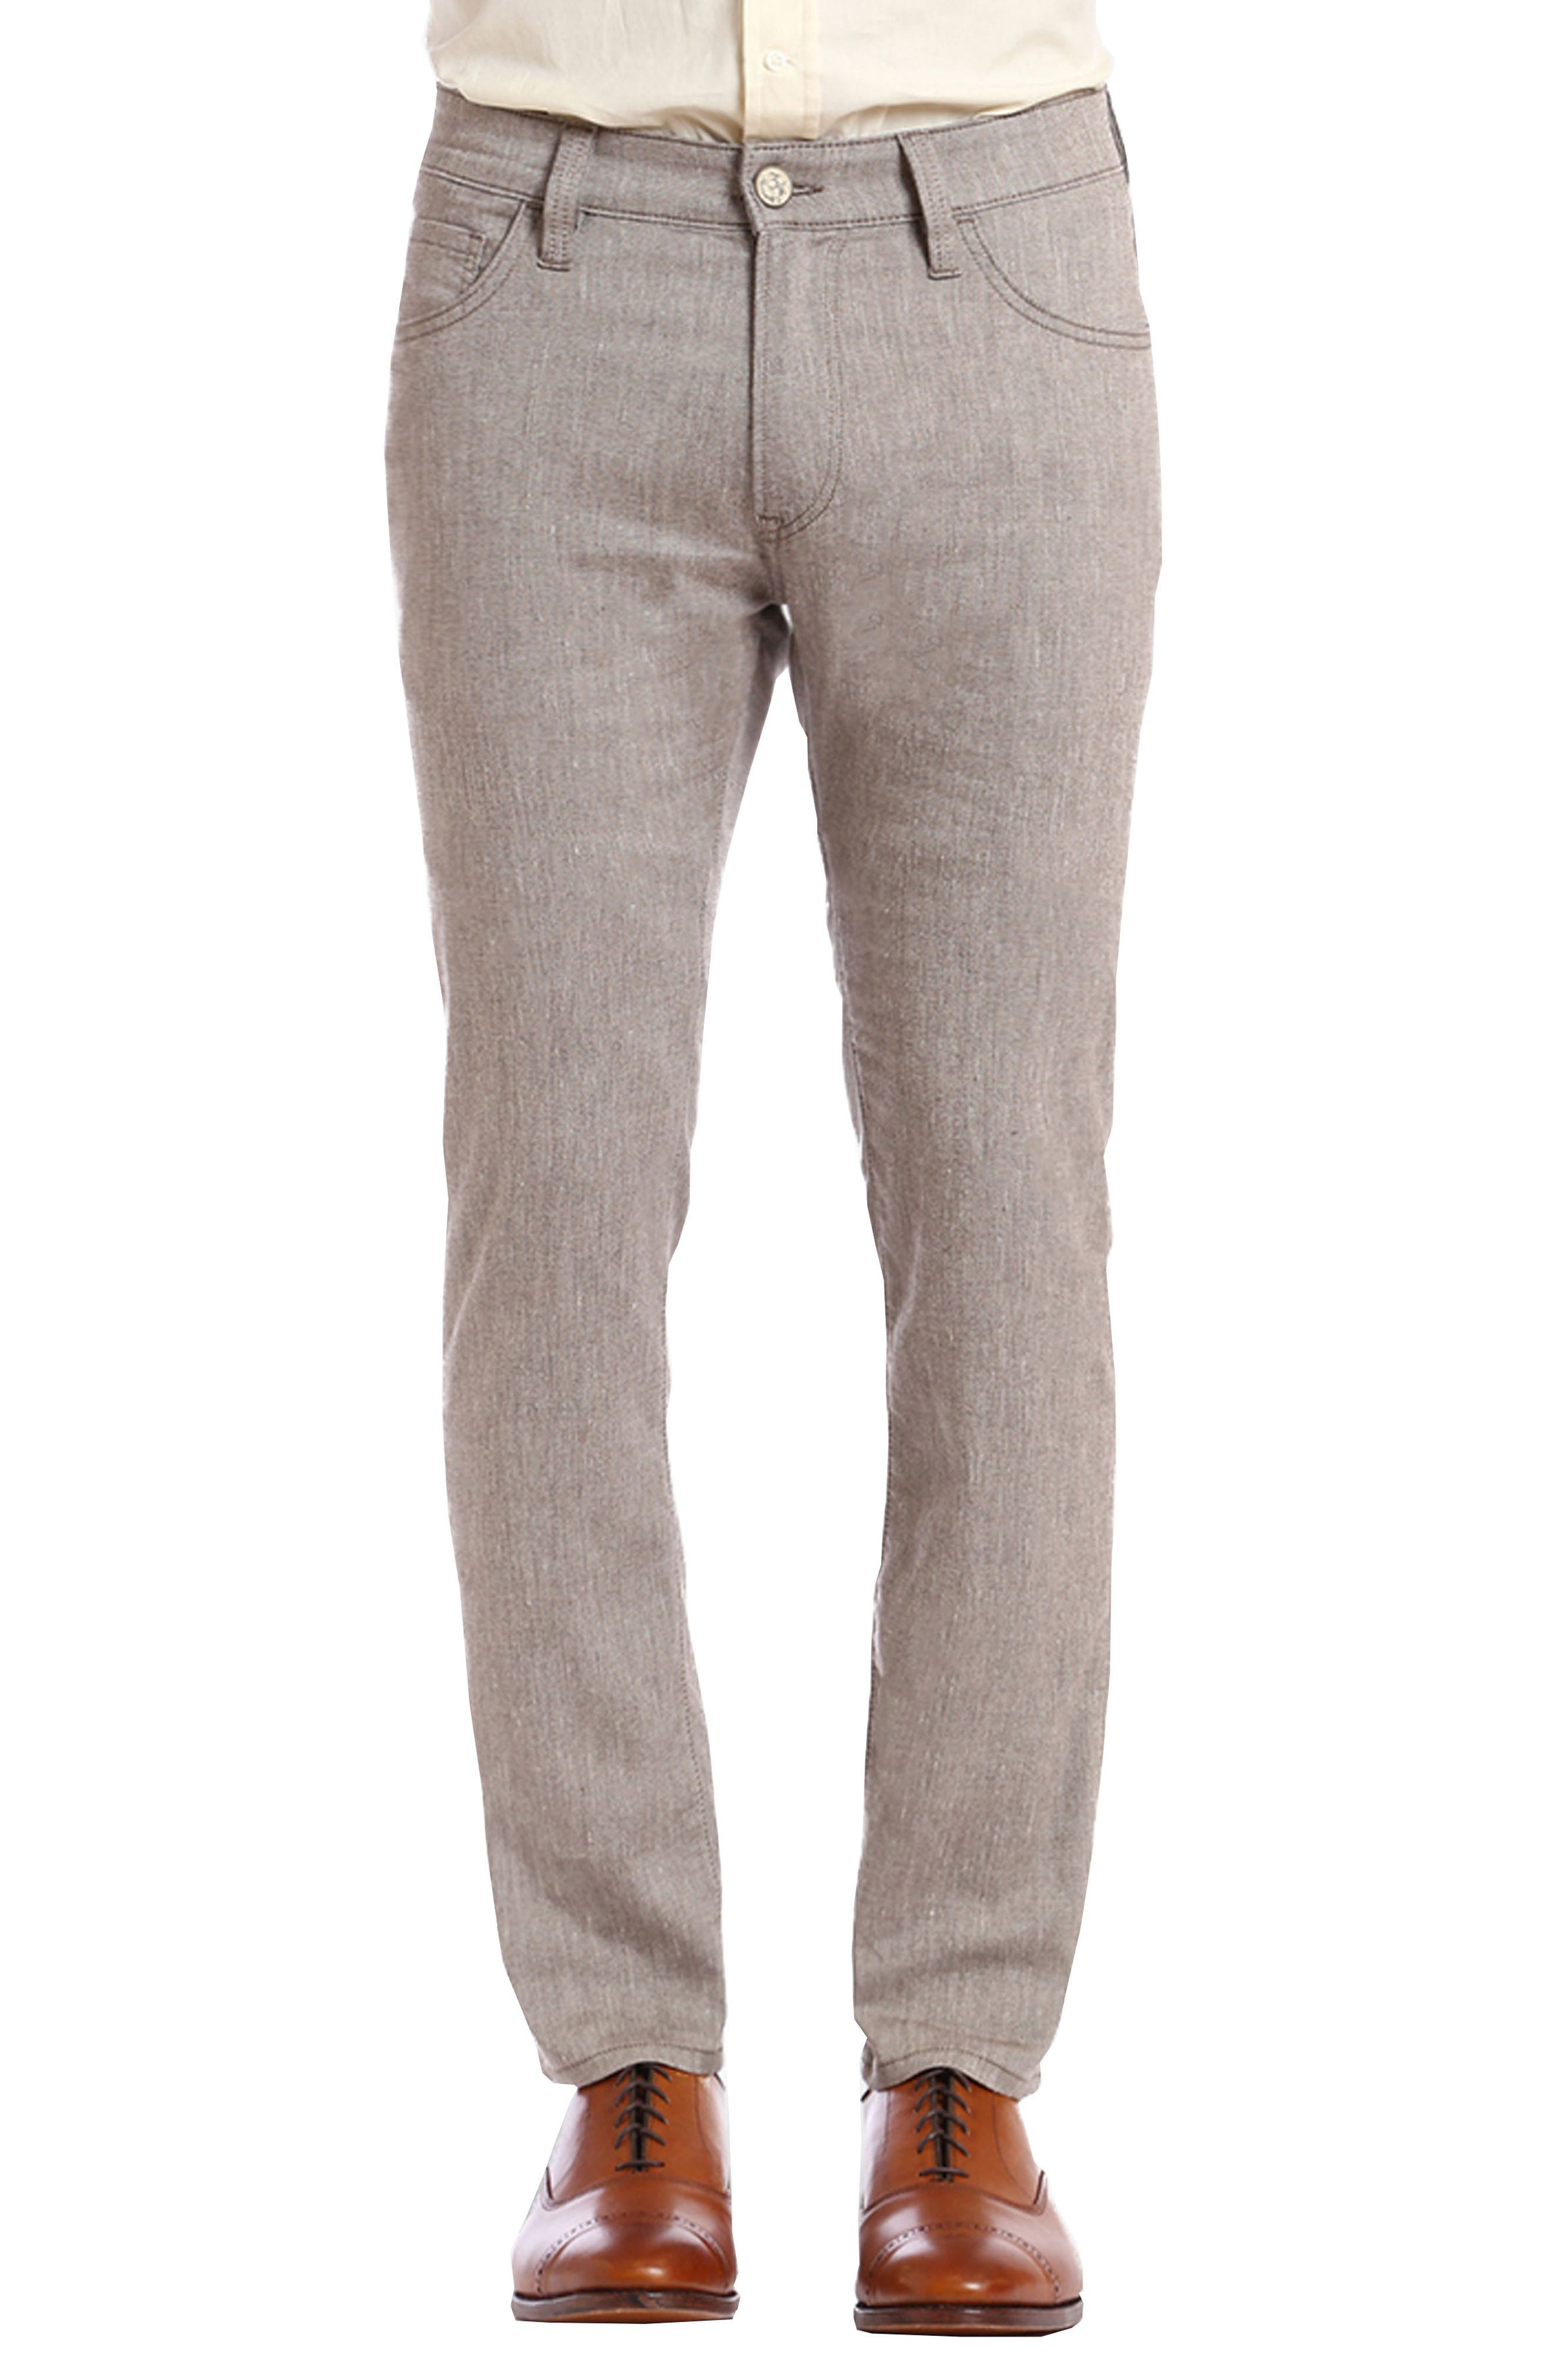 Courage Straight Leg Pants,                         Main,                         color, 200